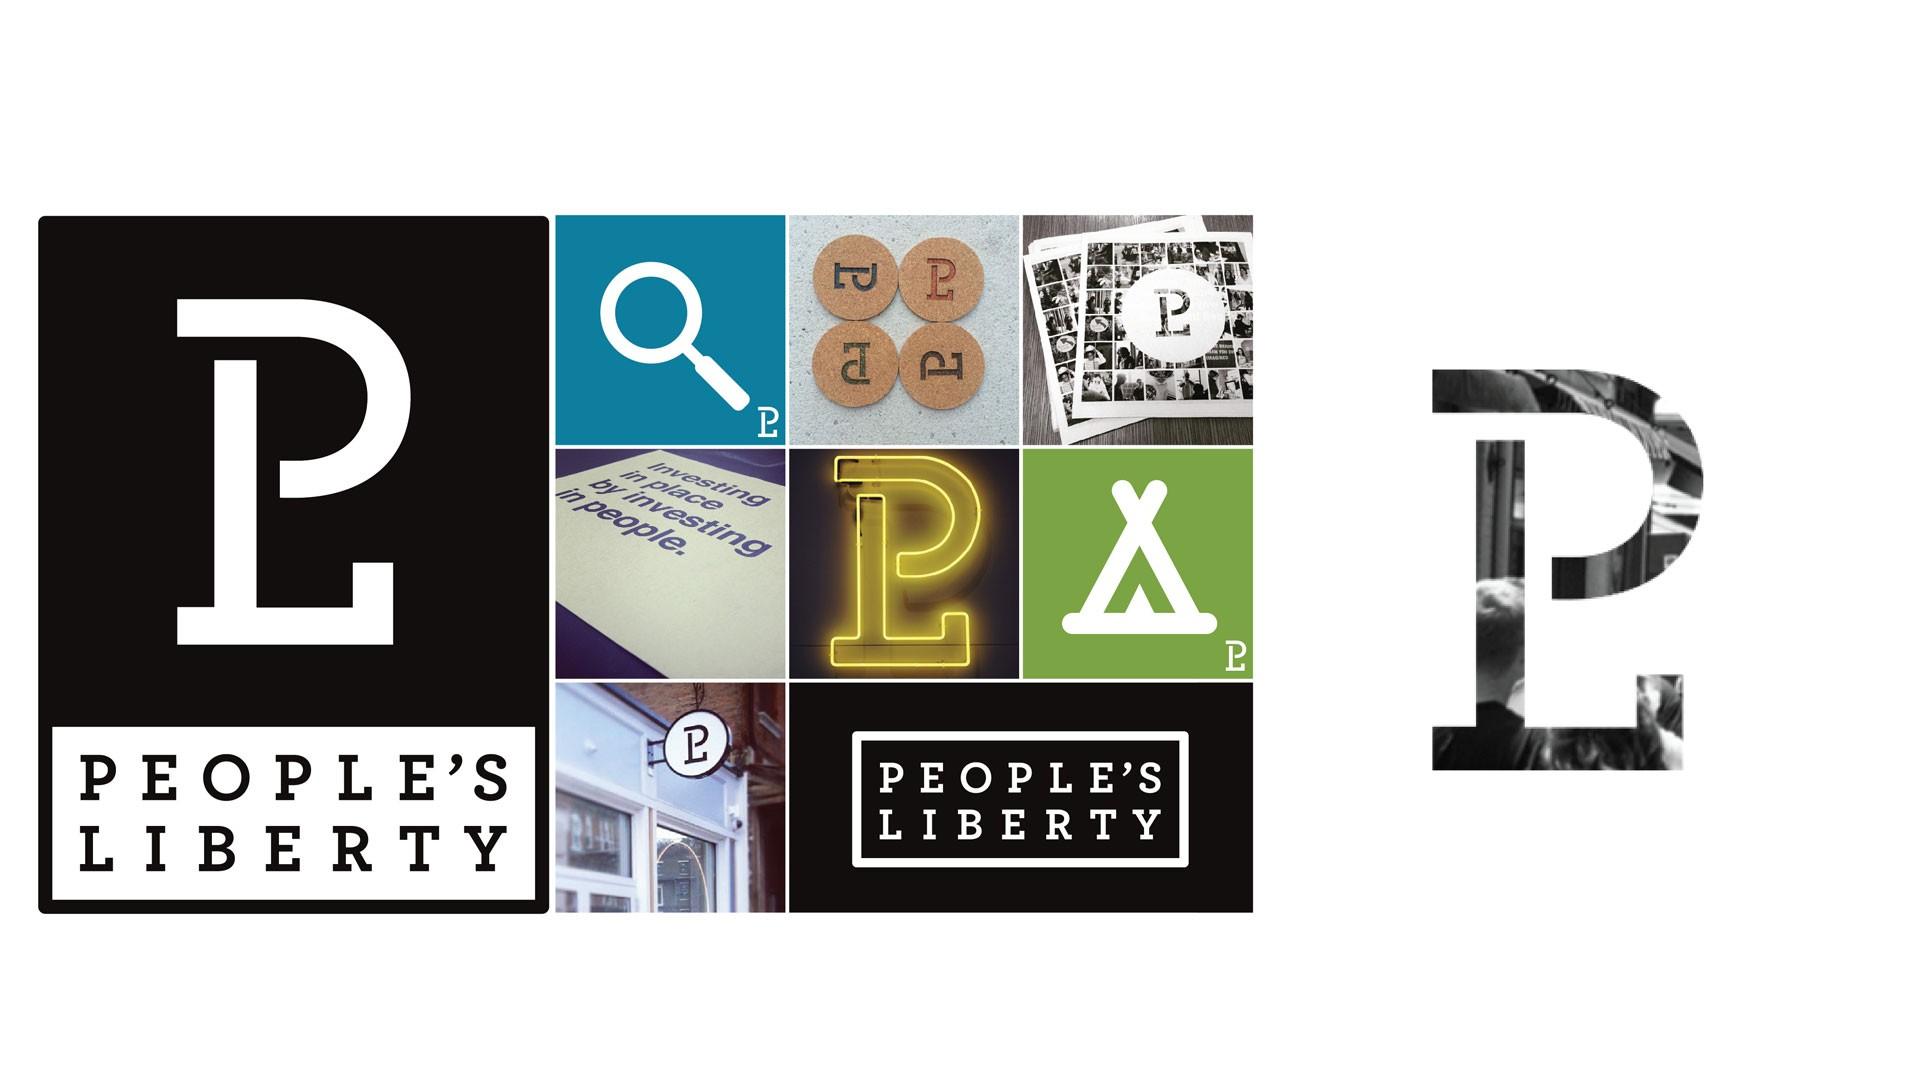 Peoples-Liberty-03